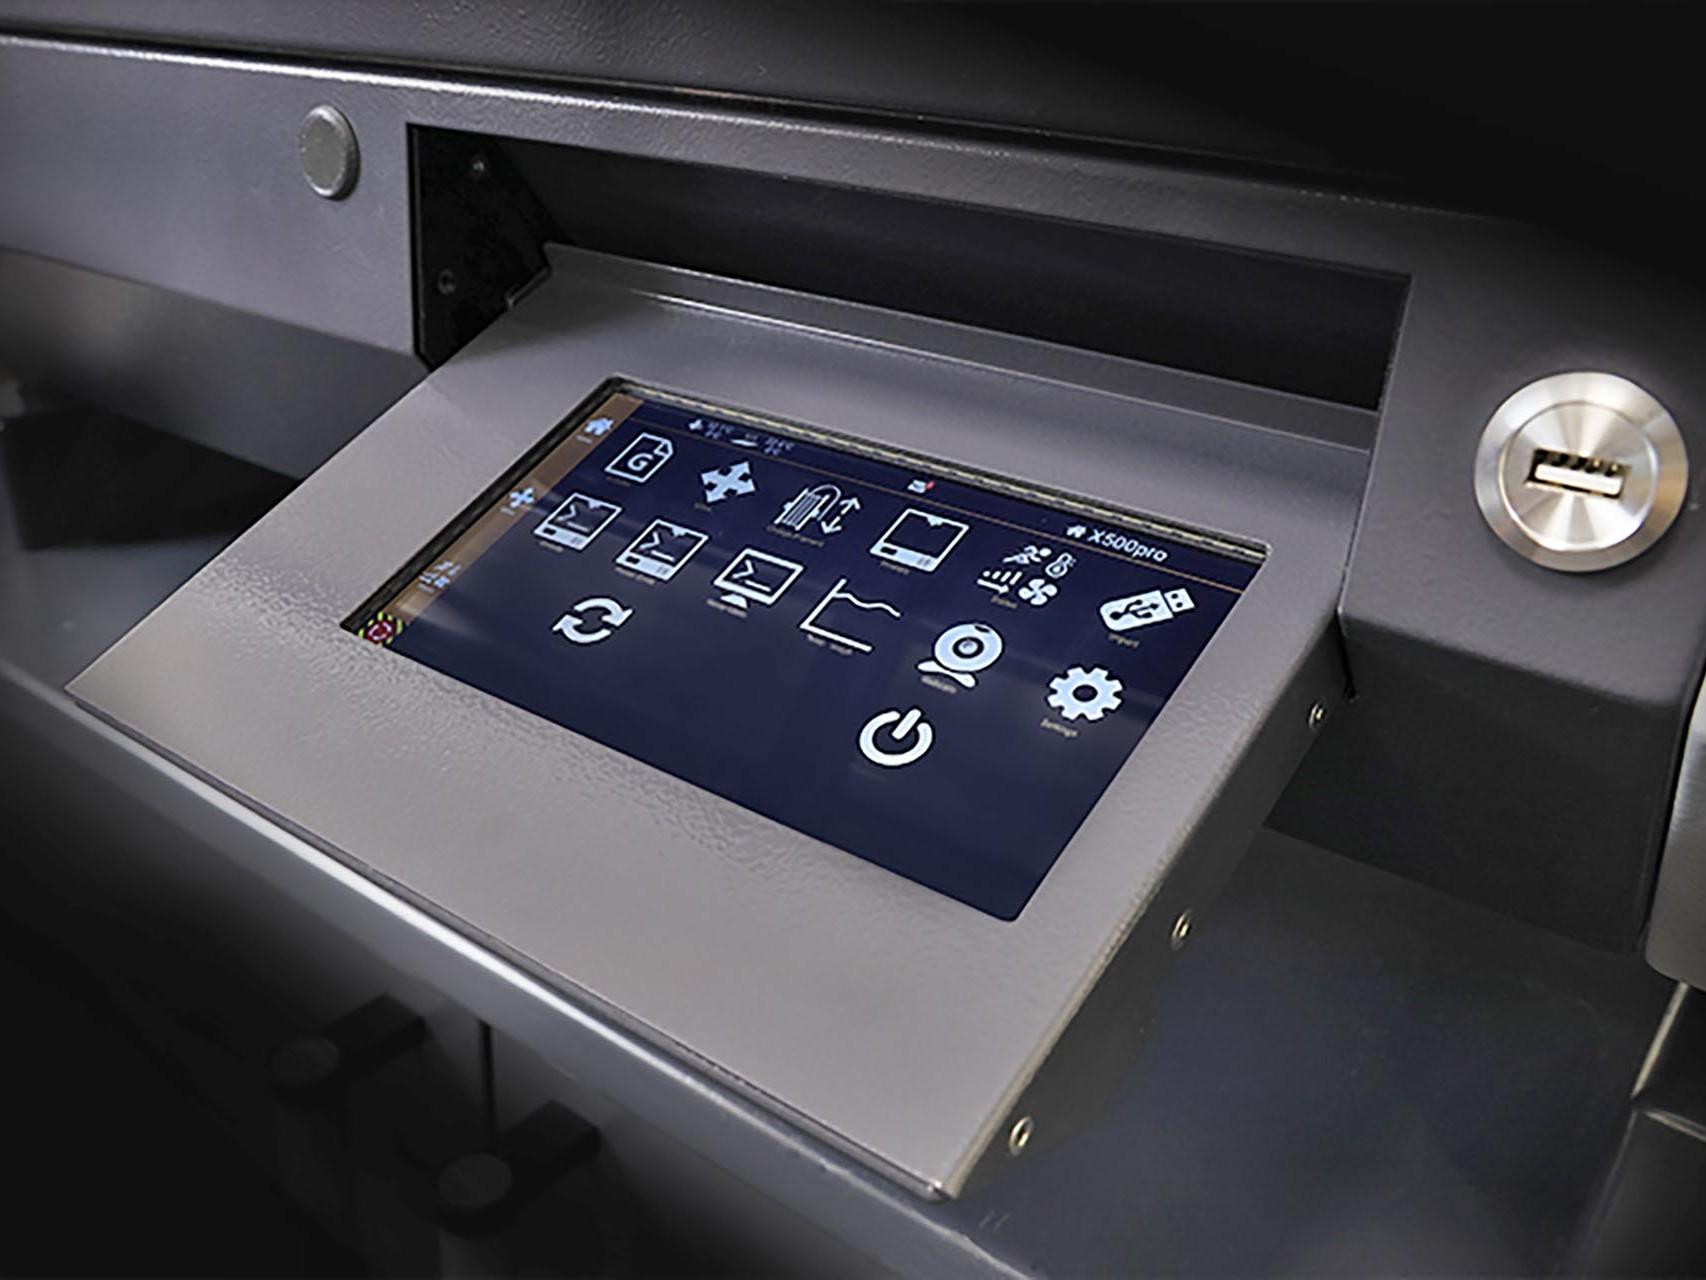 3D Drucker - x500 HMI